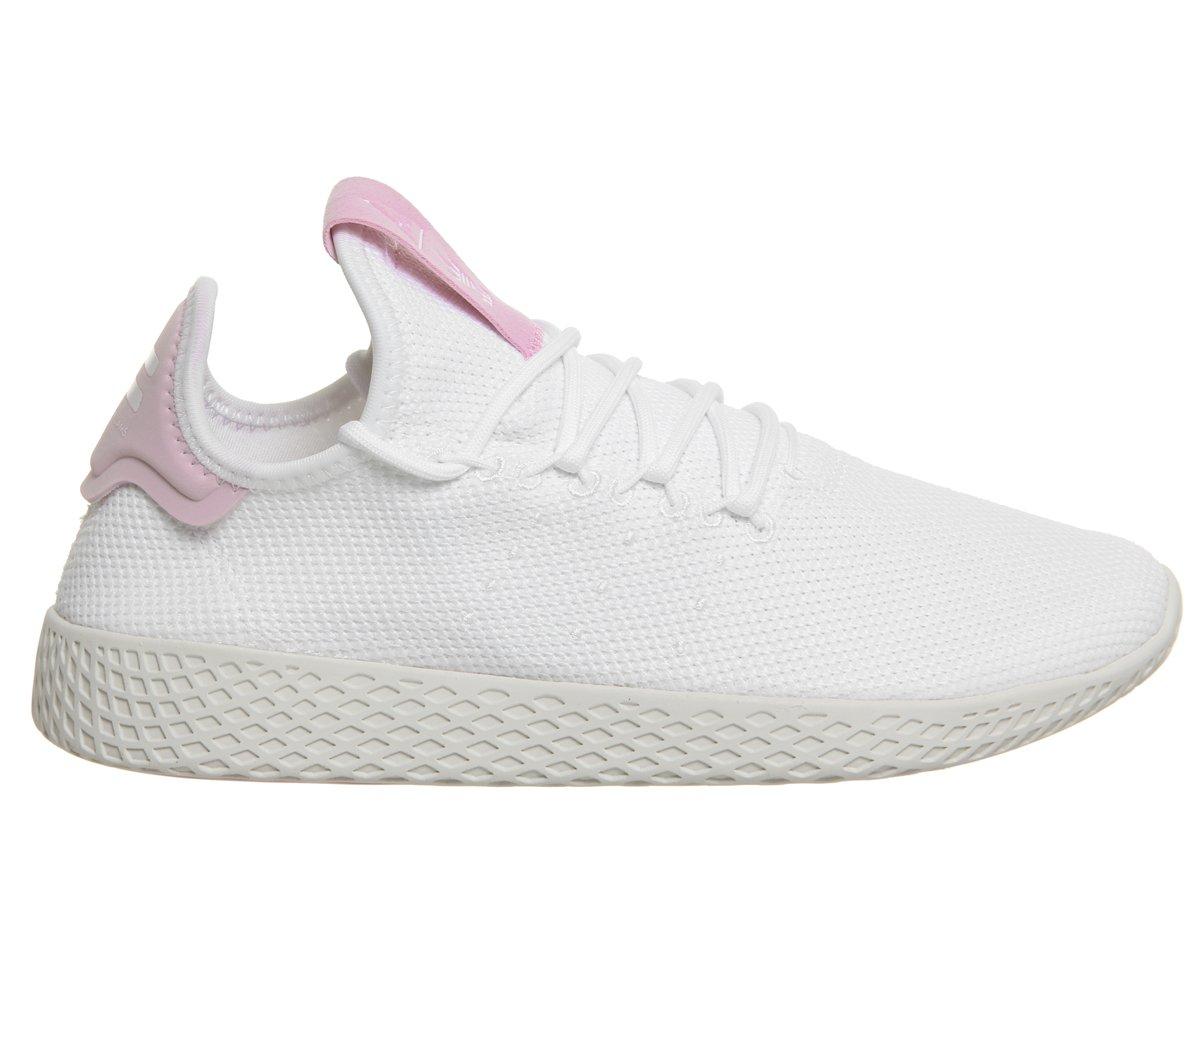 adidas Originals Sneaker PW Tennis HU W DB2558 Weiszlig; Rosa  38 EU|Wei? (Footwear White/Chalk White)